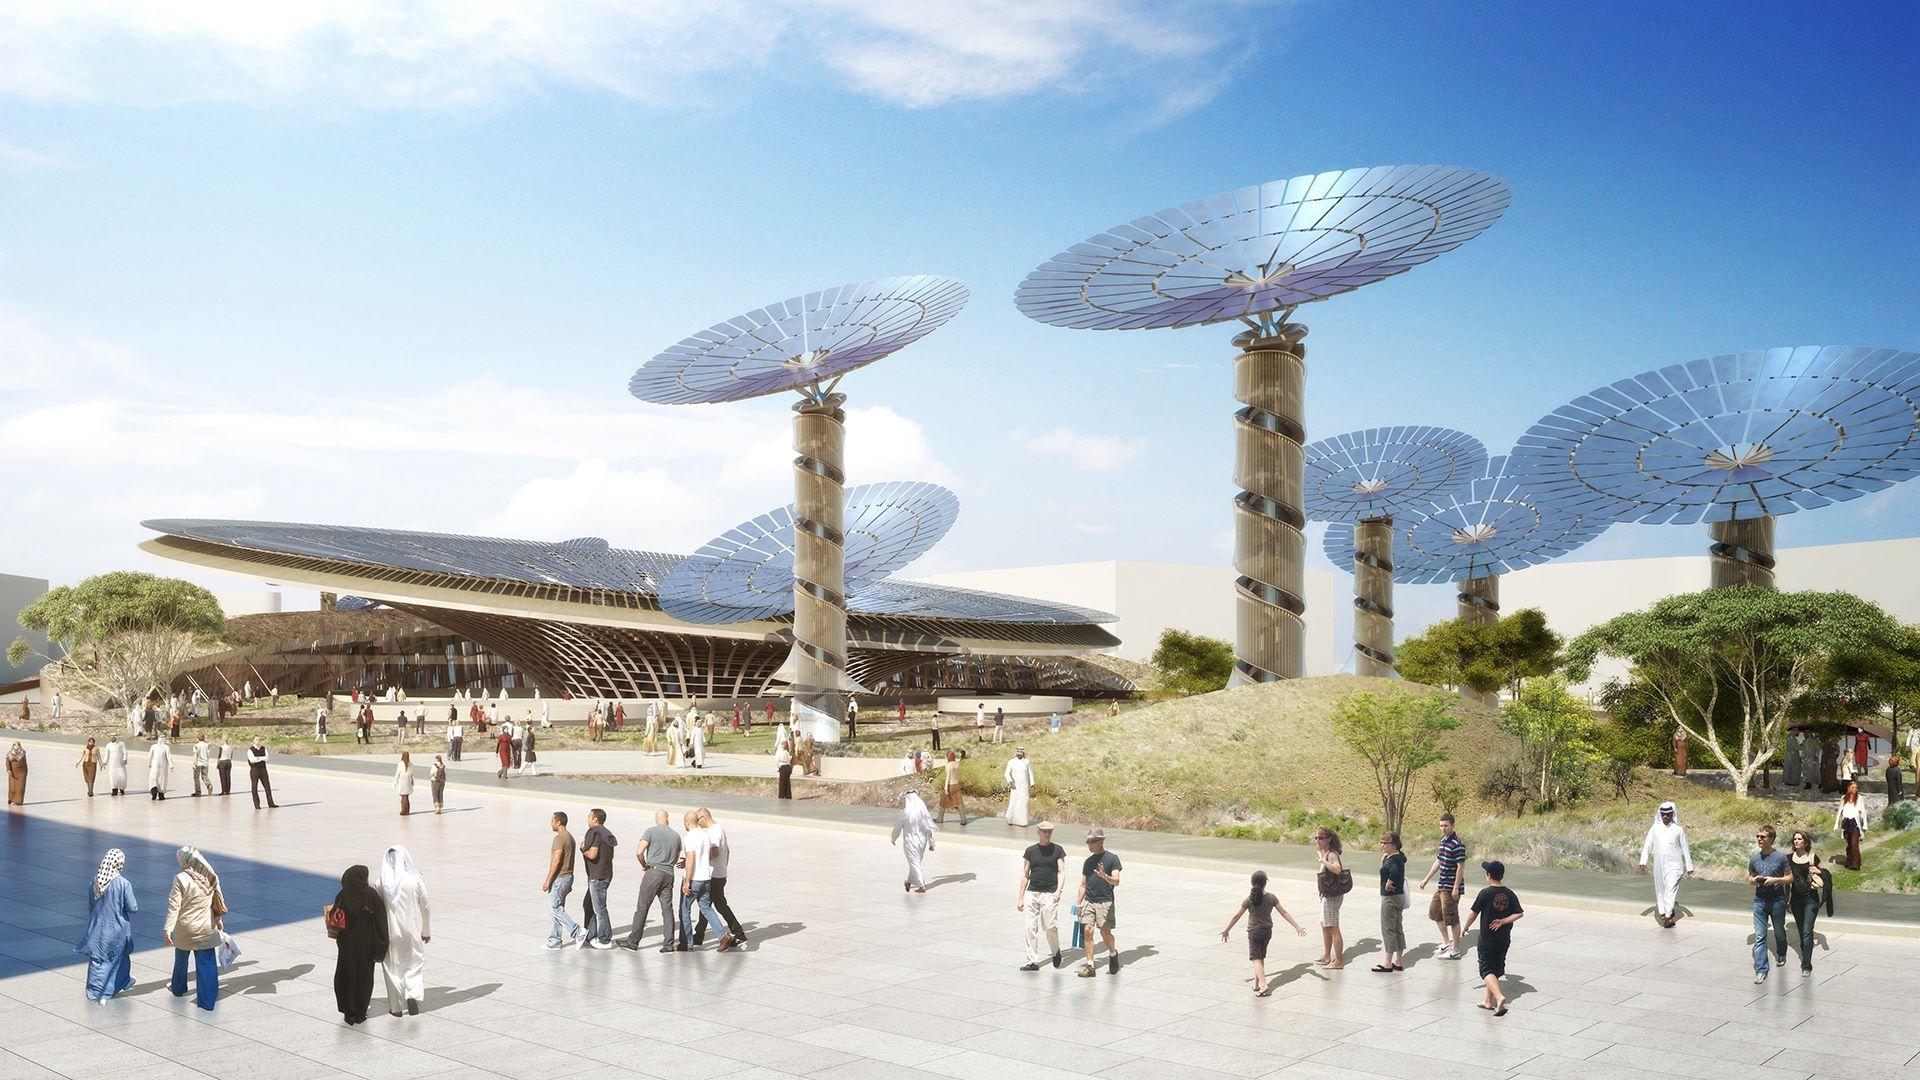 Grimshaw expo-dubai-2020-confira-como-o-projeto-dos-pavilhoes